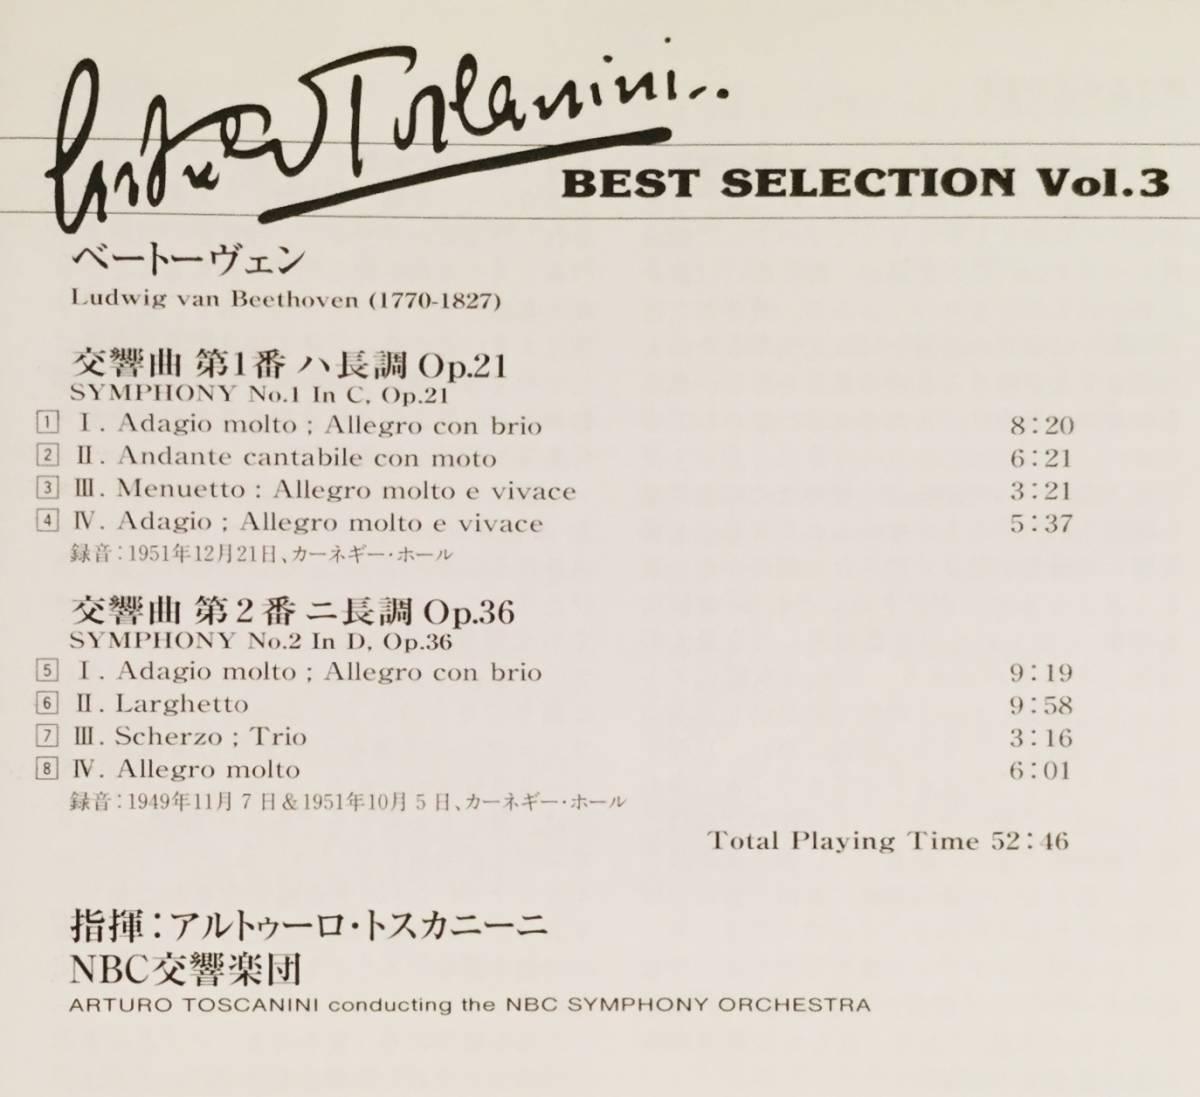 CD(完全限定盤)▲ベートーヴェン:交響曲 第1番&第2番◎アルトゥール・トスカニーニ指揮▲帯付美品!_画像3